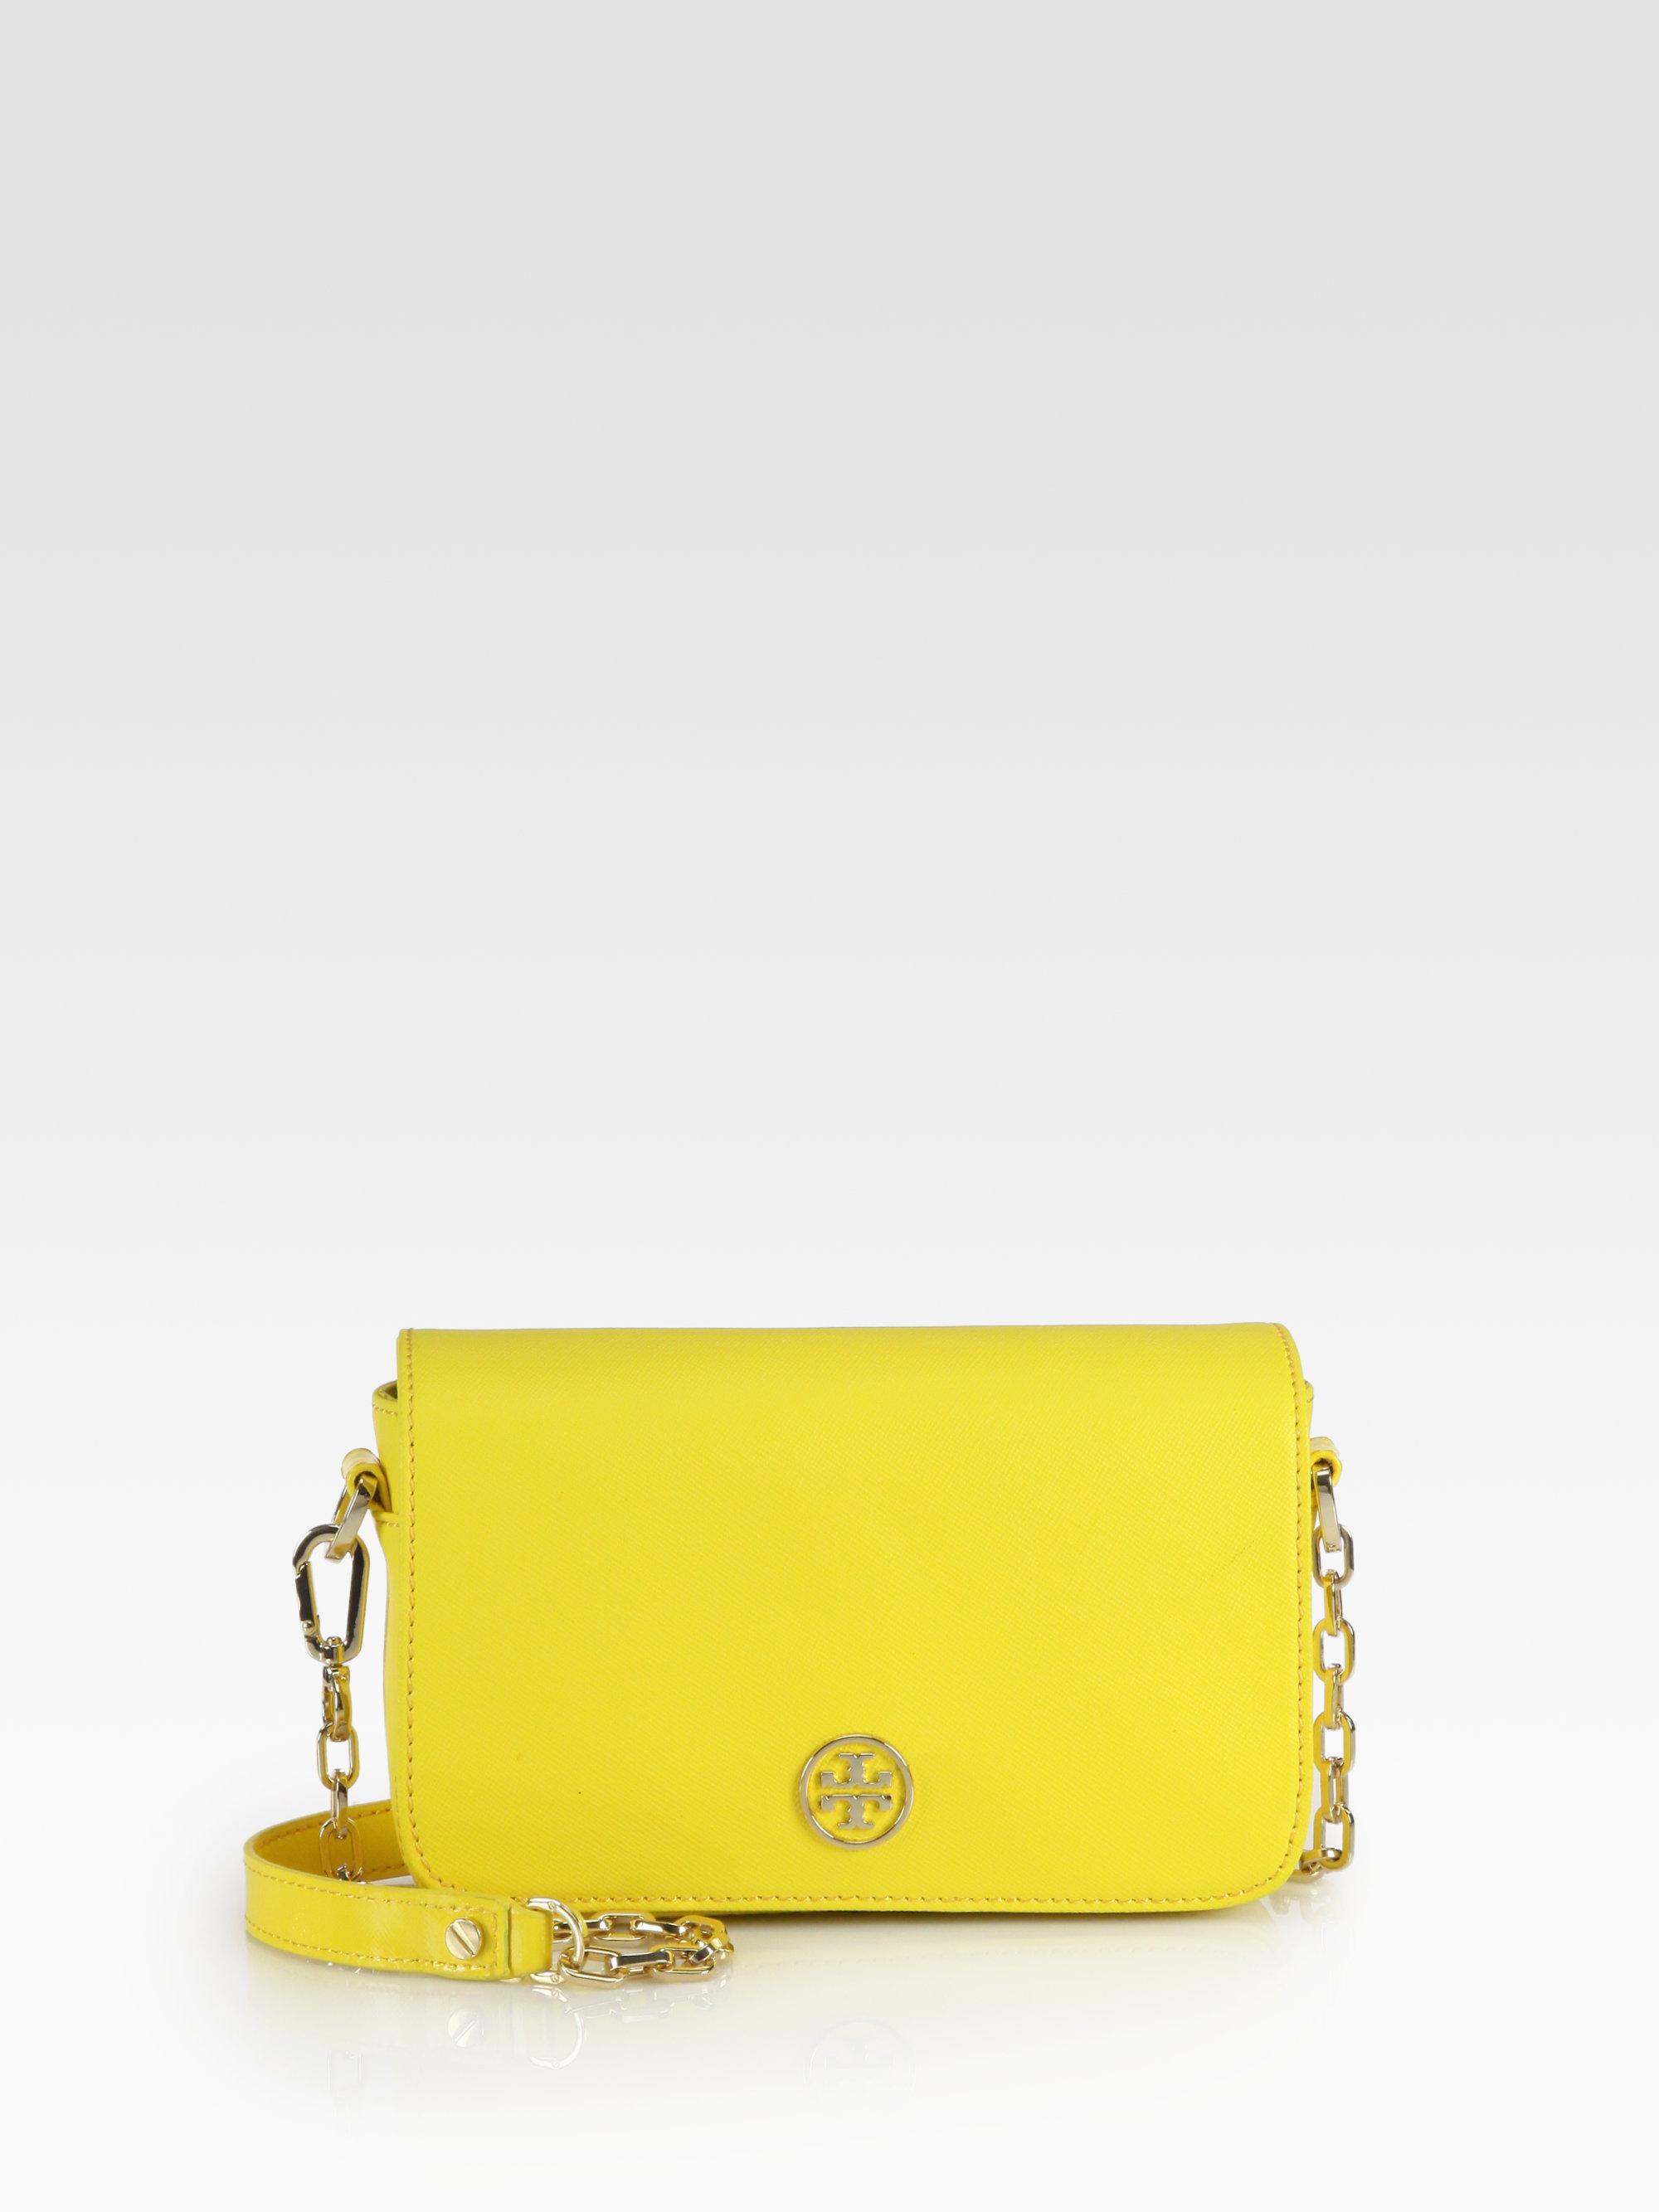 522d1c3c55 Tory Burch Robinson Mini Shoulder Bag in Yellow - Lyst